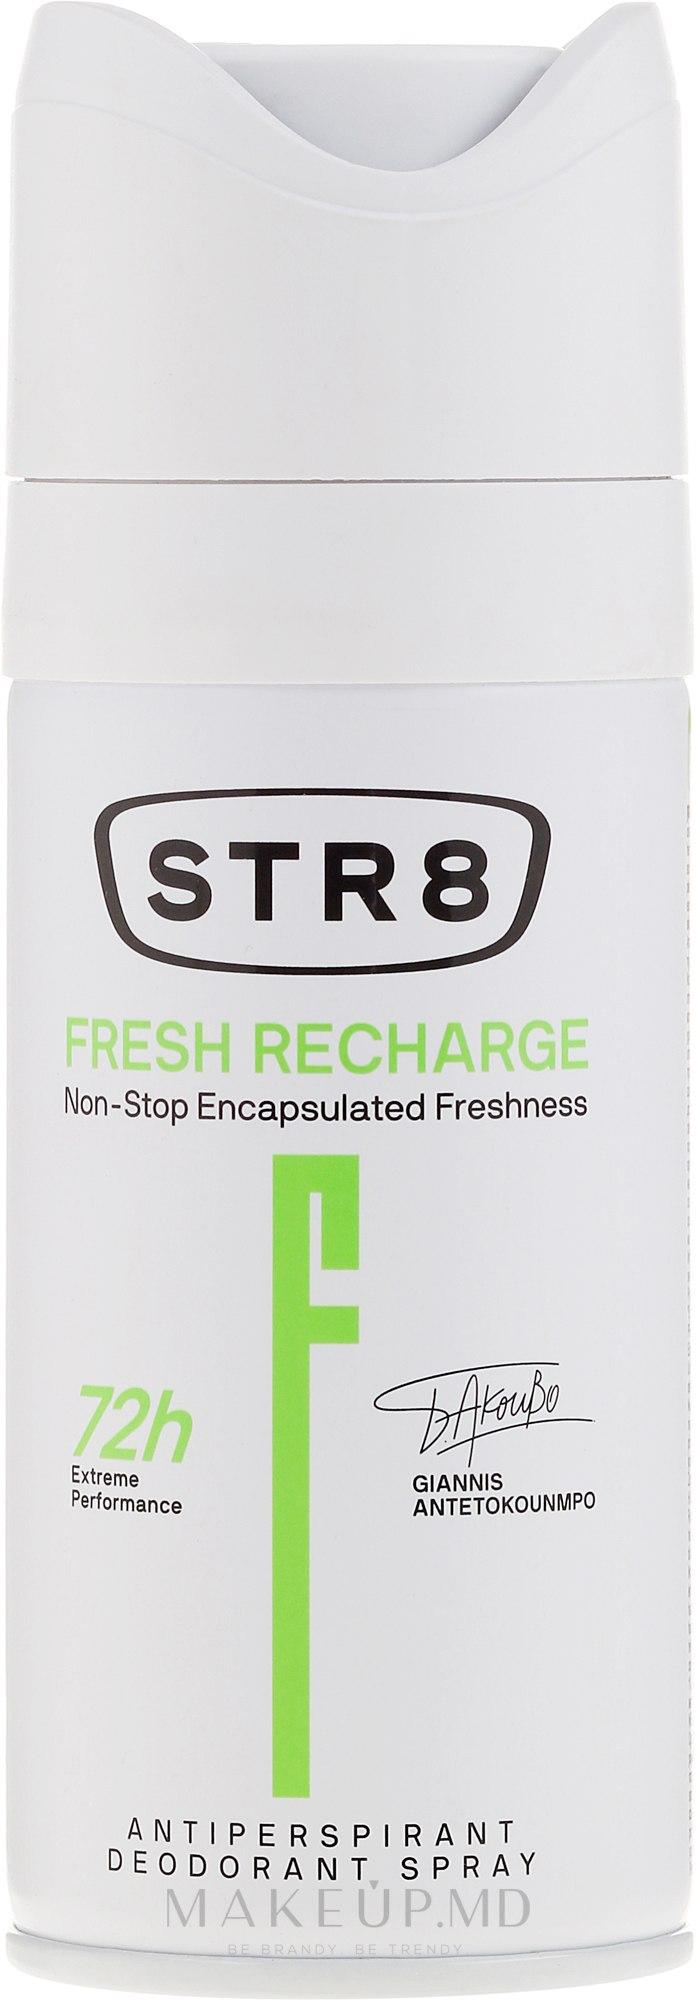 Deodorant - STR8 Fresh Recharge Antiperspirant Deodorant Spray — Imagine 150 ml